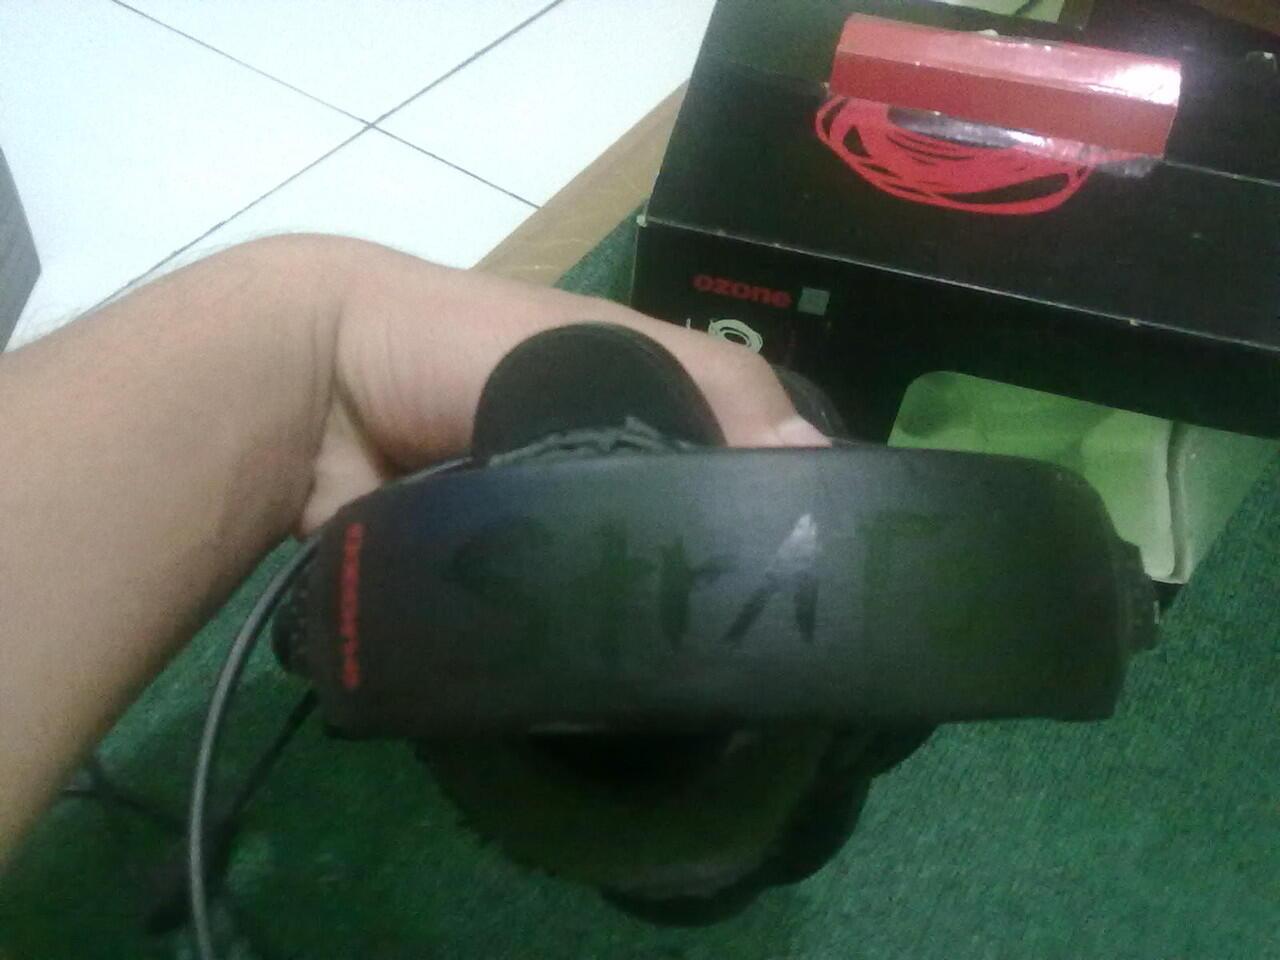 [BANDUNG] HEADSET Ozone Strato (5.1 Surround, Proffesional Gaming Headset)